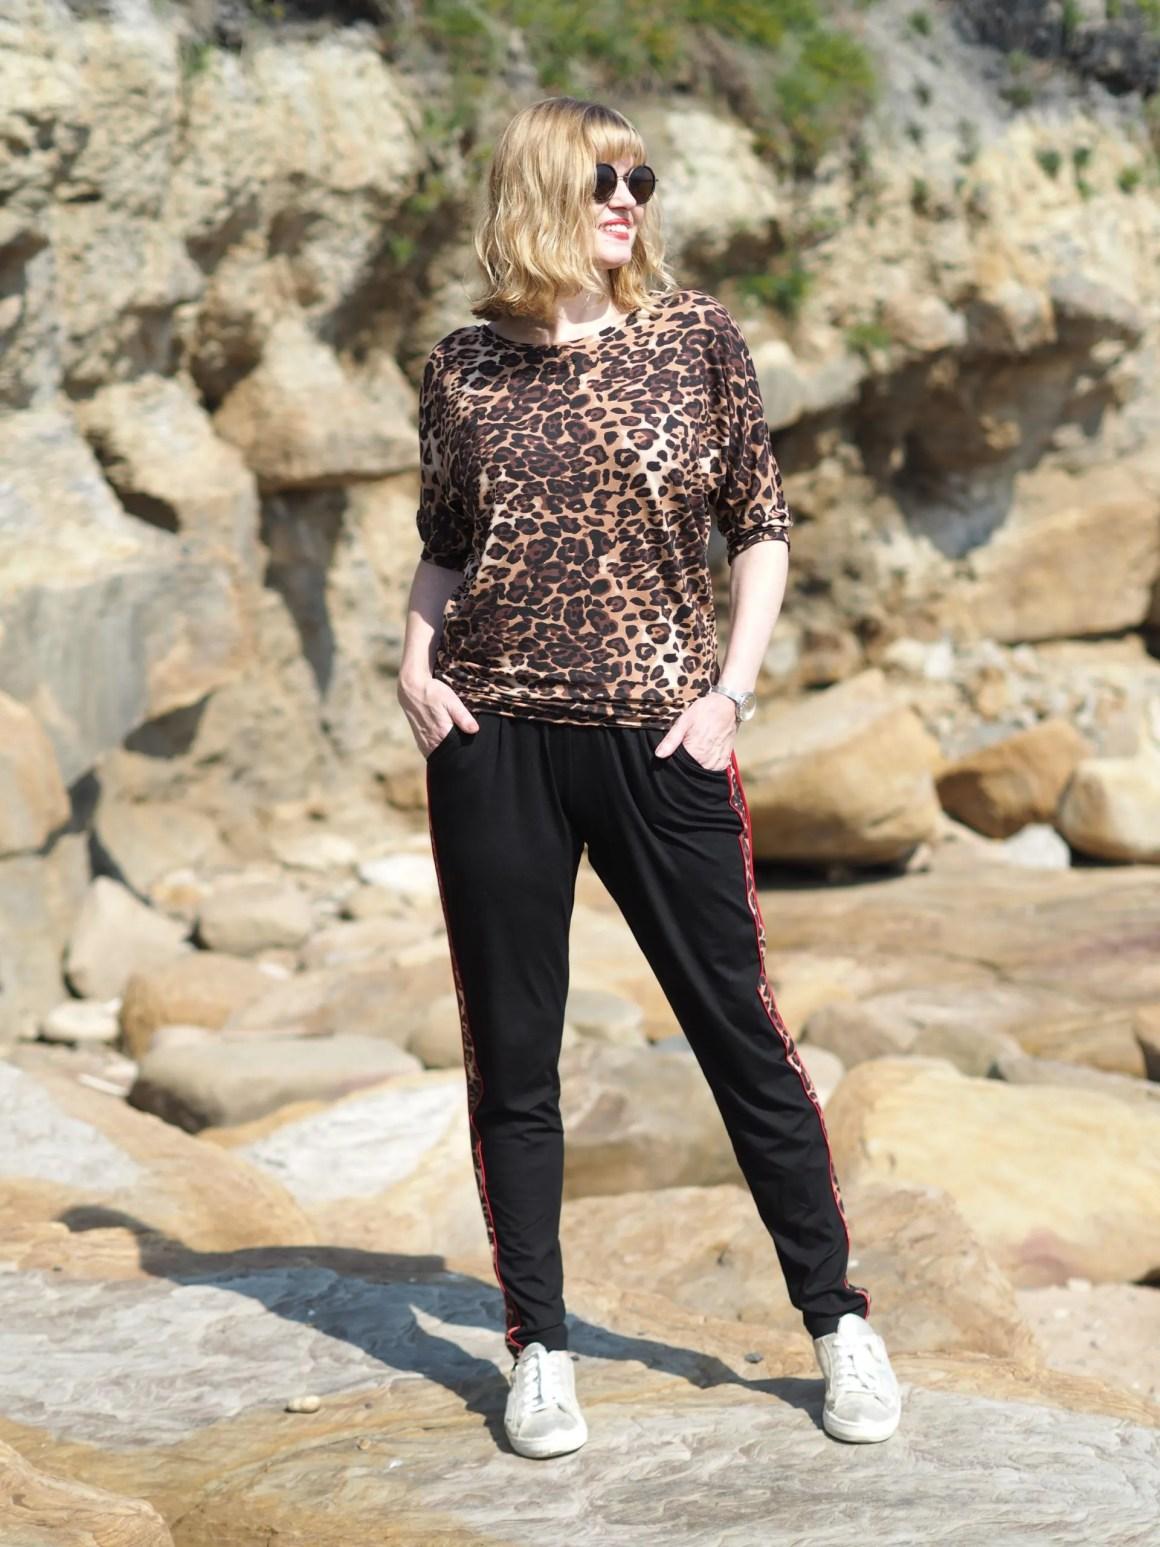 Leopard print ethical yoga pants